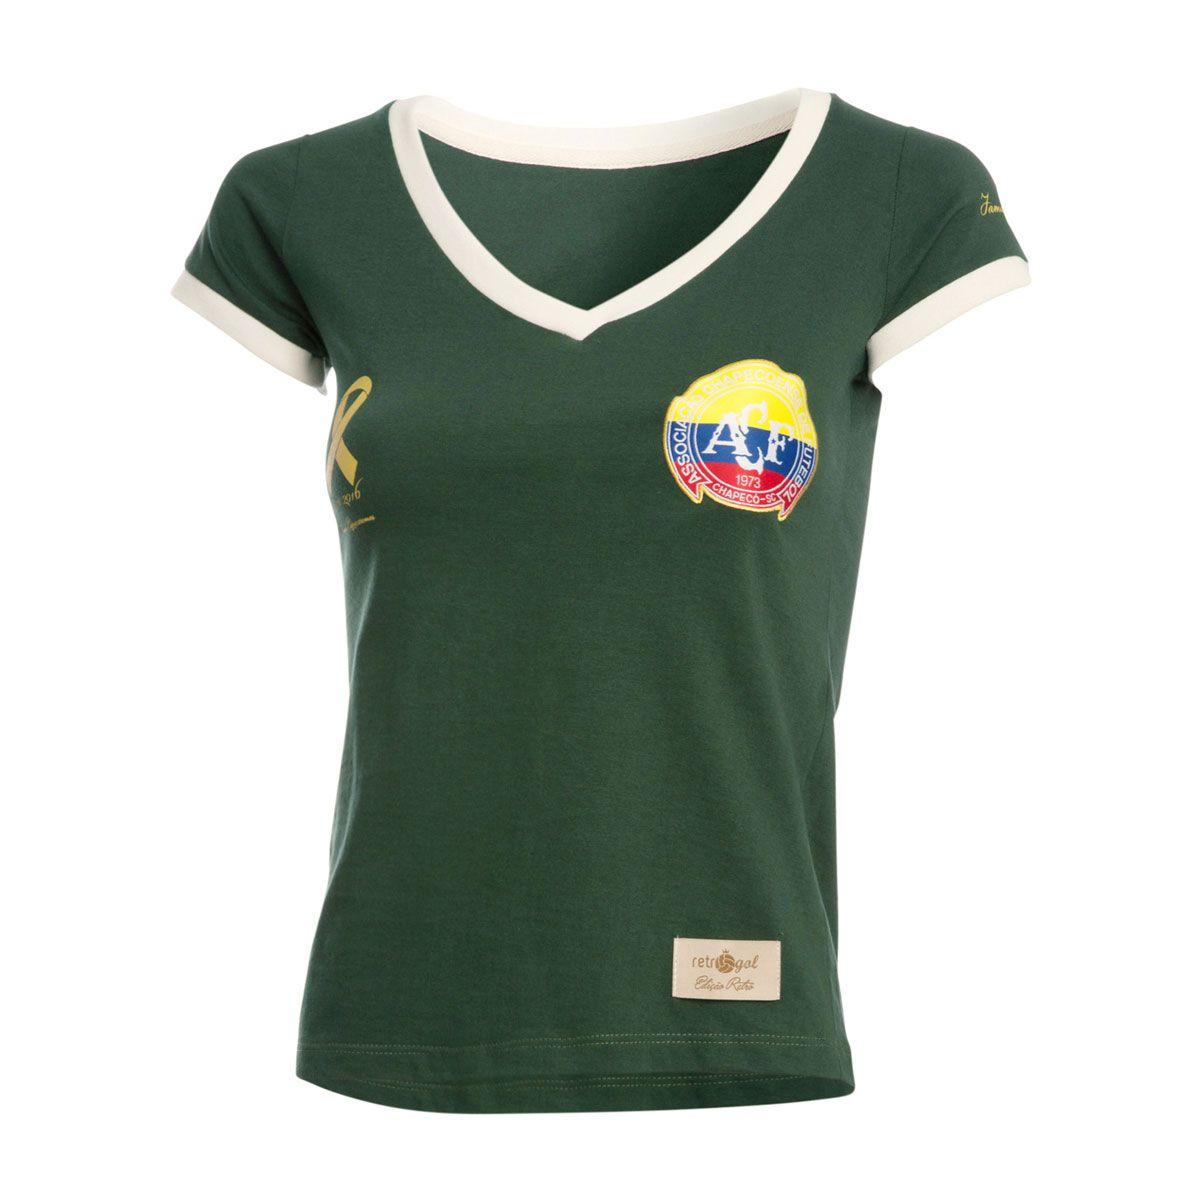 Camisa Baby Look Solidária Retrô Gol Chapecoense Torcedor